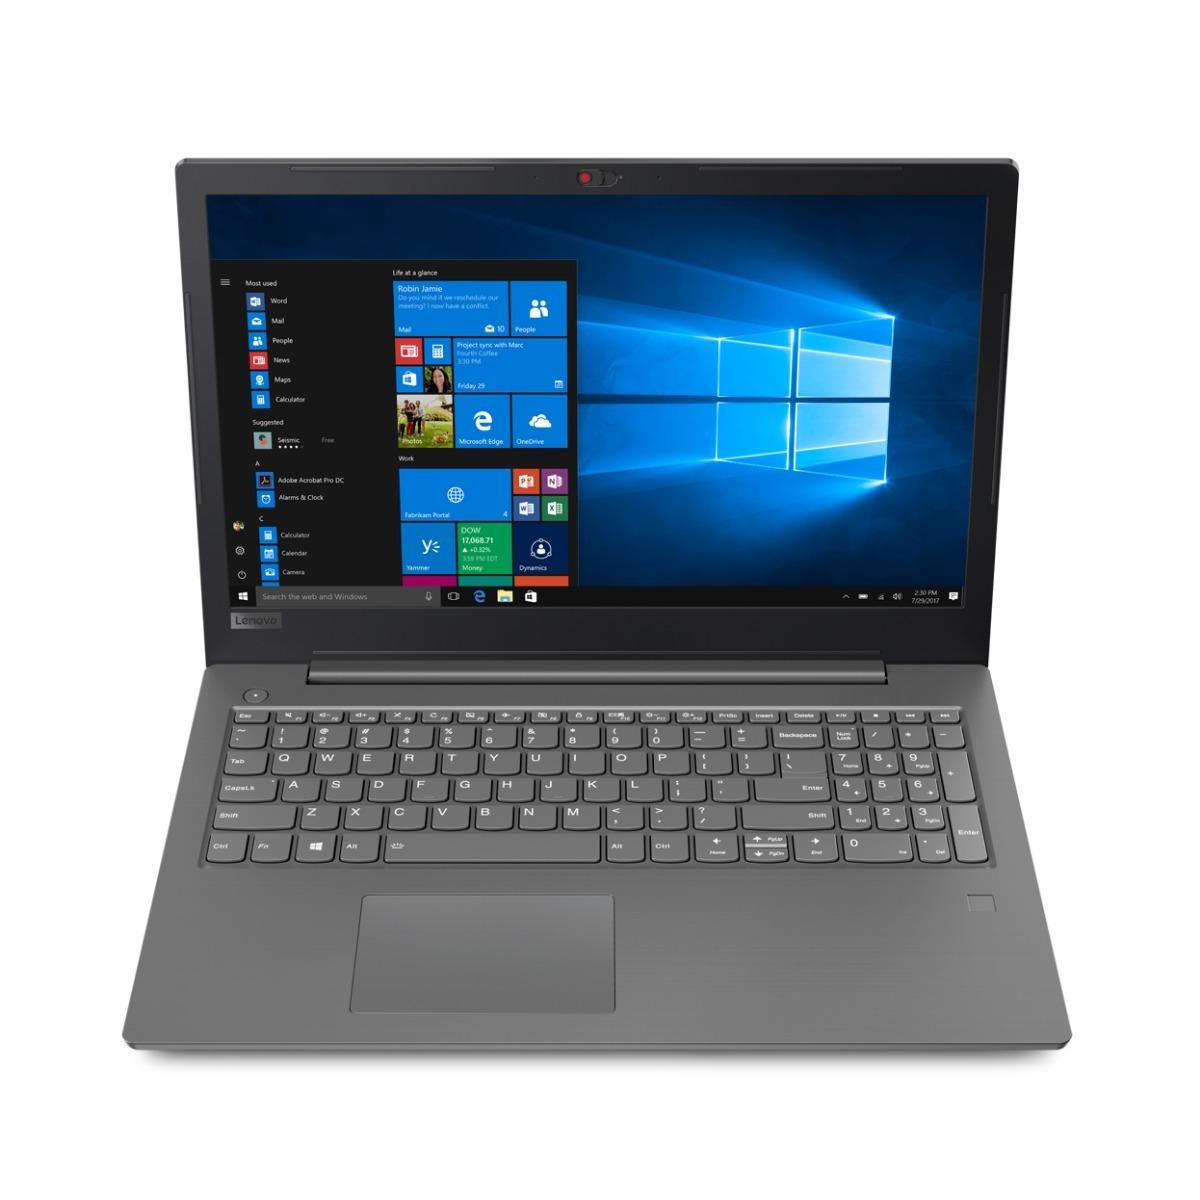 Notebook Lenovo V330 i3 7020U 4G 1Tb SSD-120Gb 15.6 Free s/Dvd